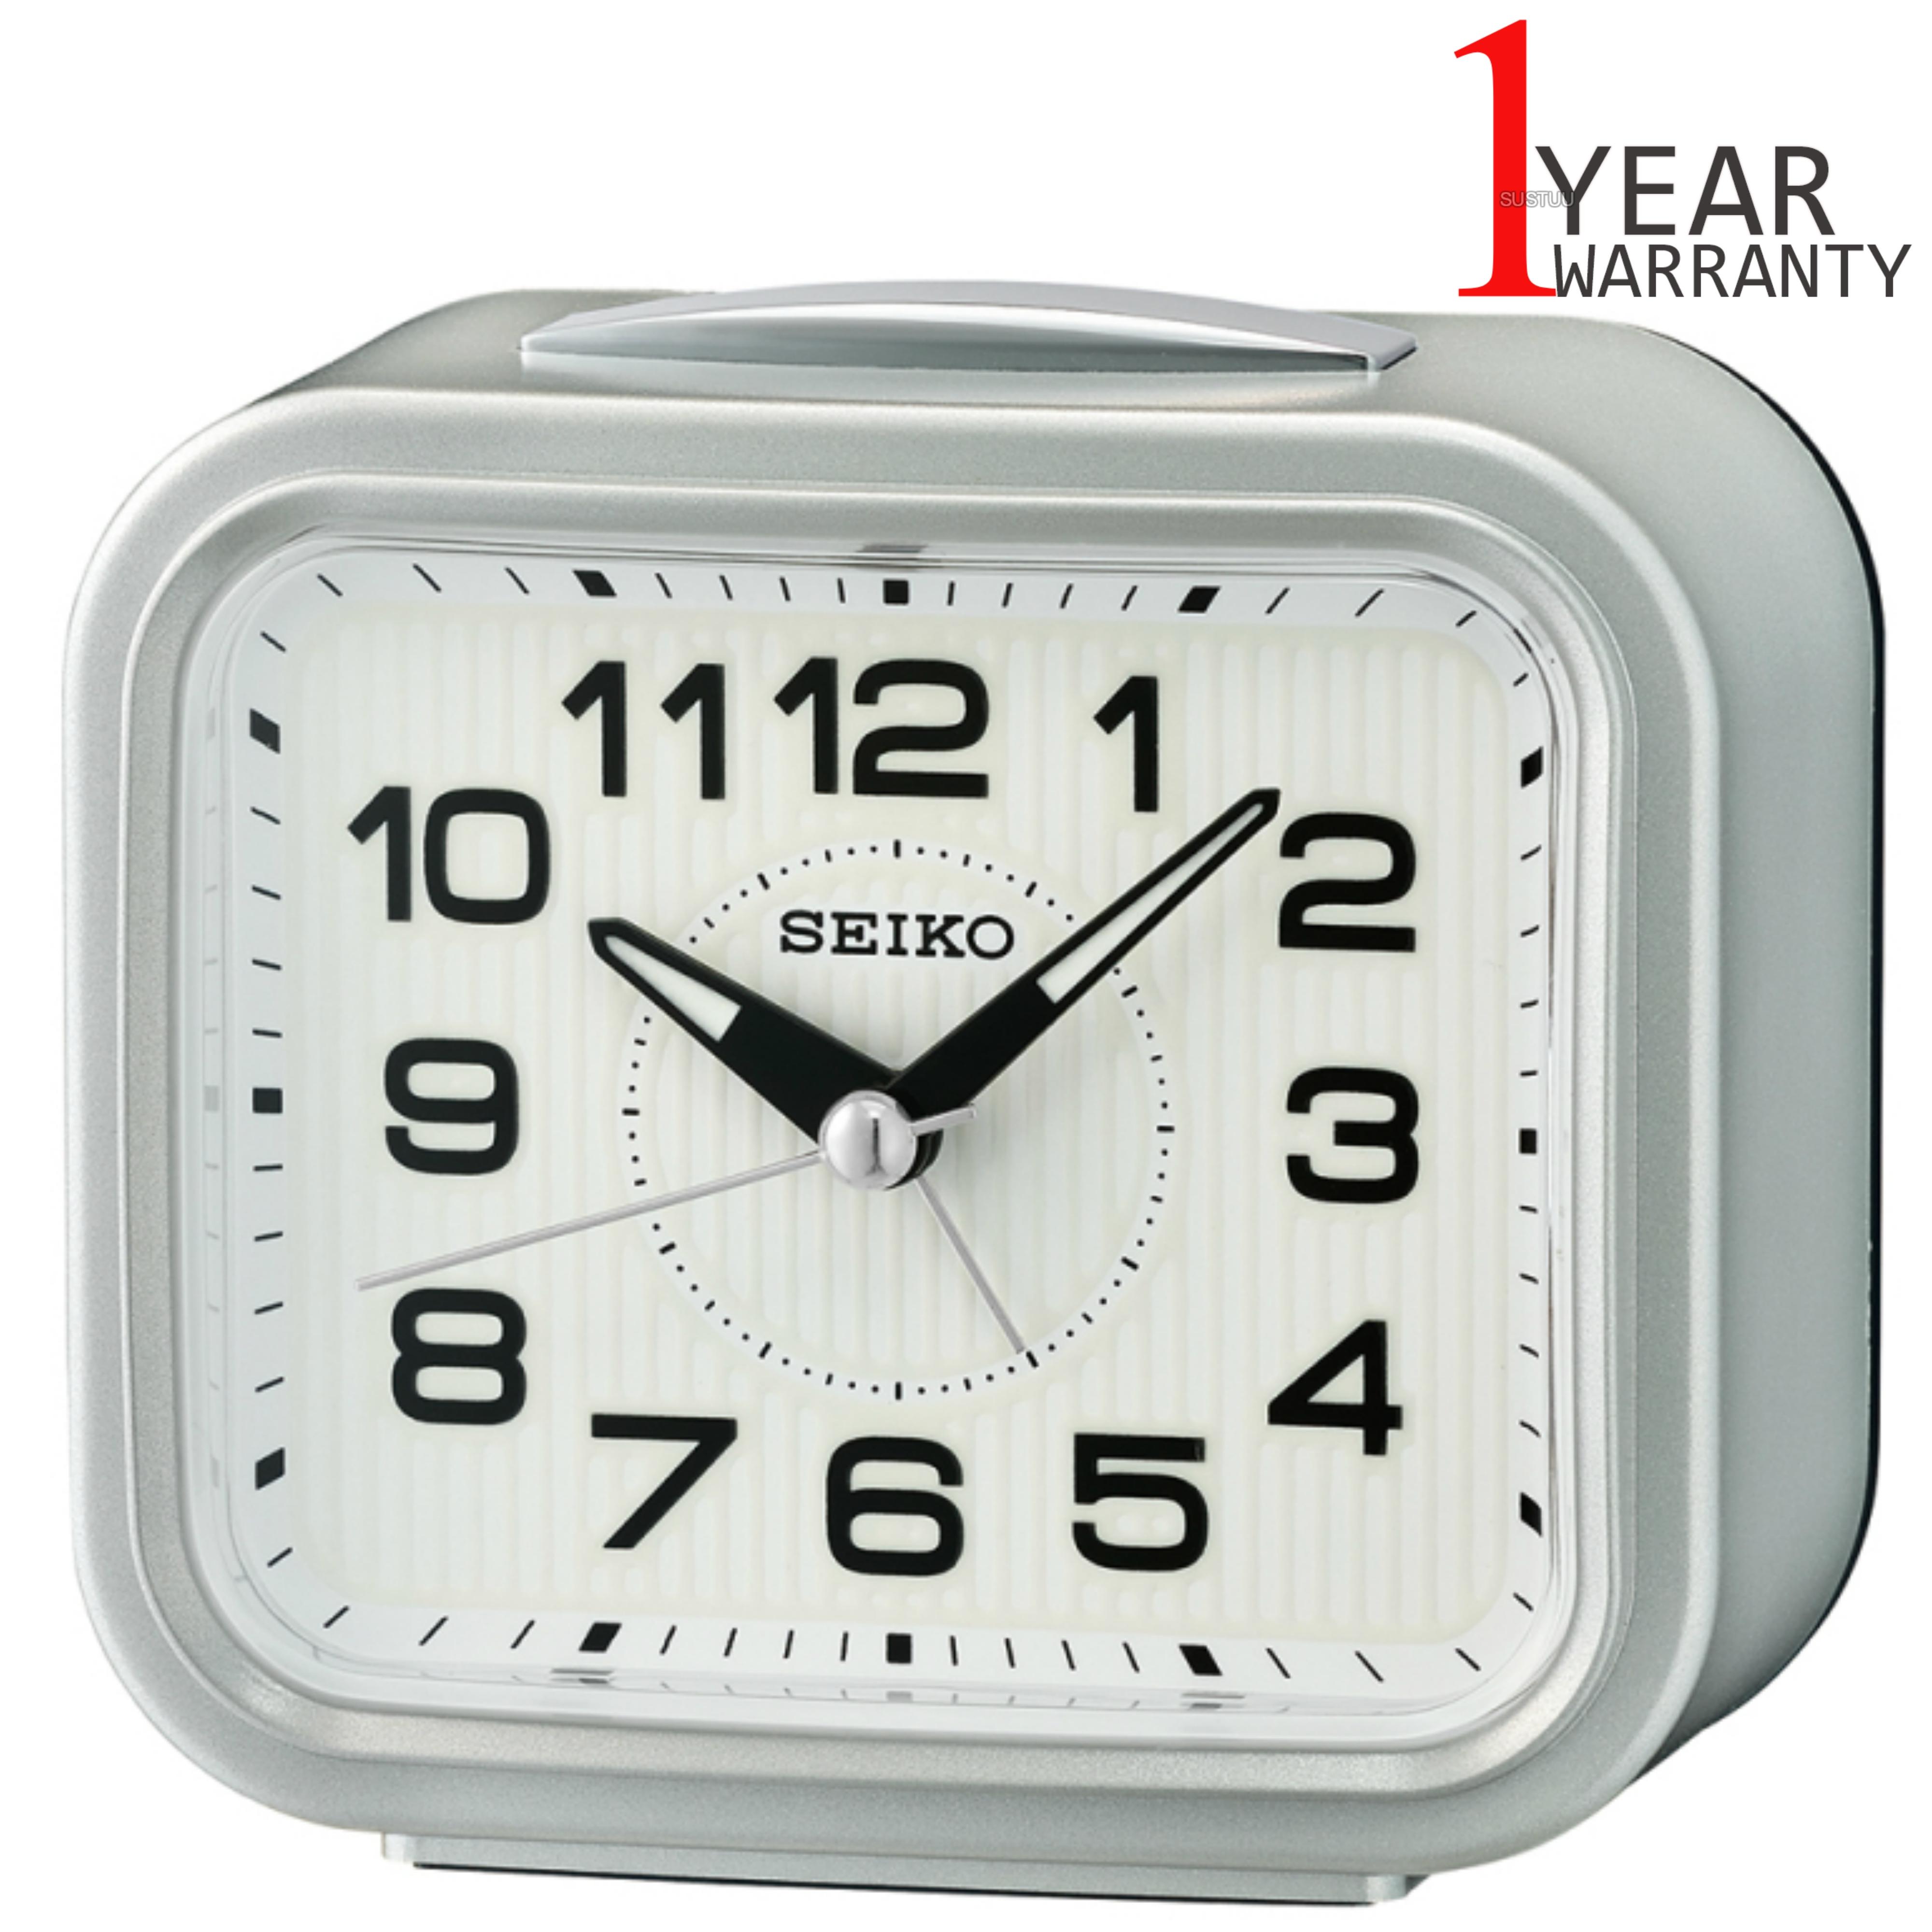 Seiko Bell Alarm Clock With Snooze   Plastic Case Material   Metallic Silver   QHK050S